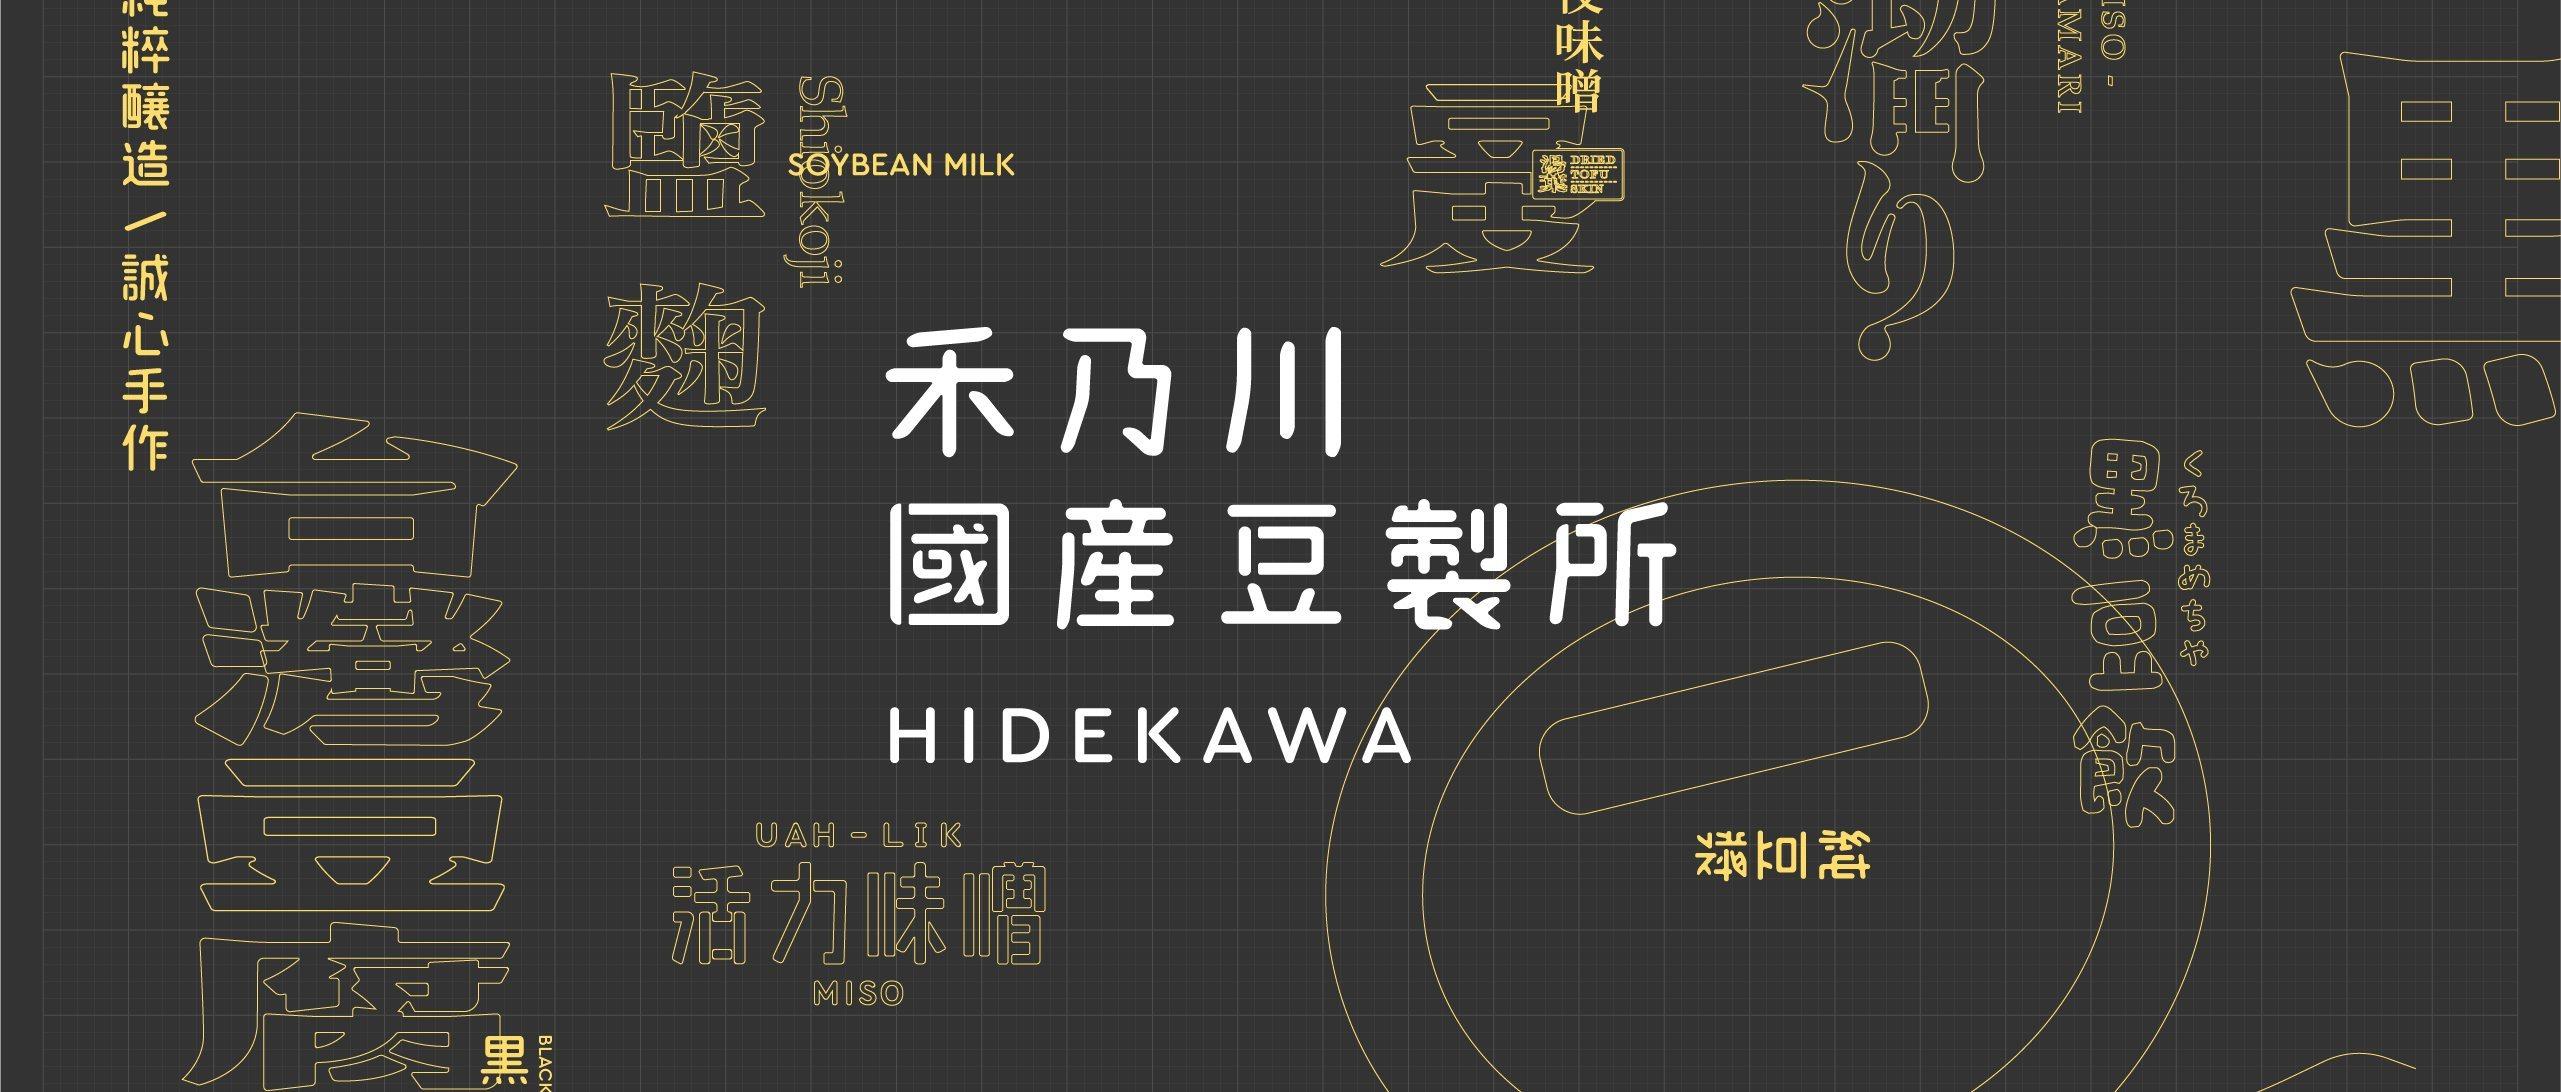 HIDEKAWA Domestic Soybean Products - Taiwan brand design